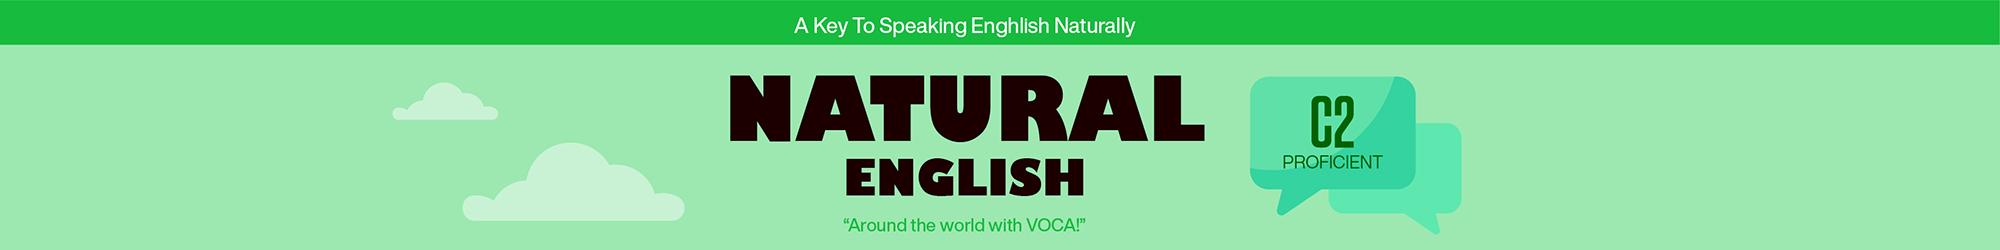 NATURAL ENGLISH C2 banner